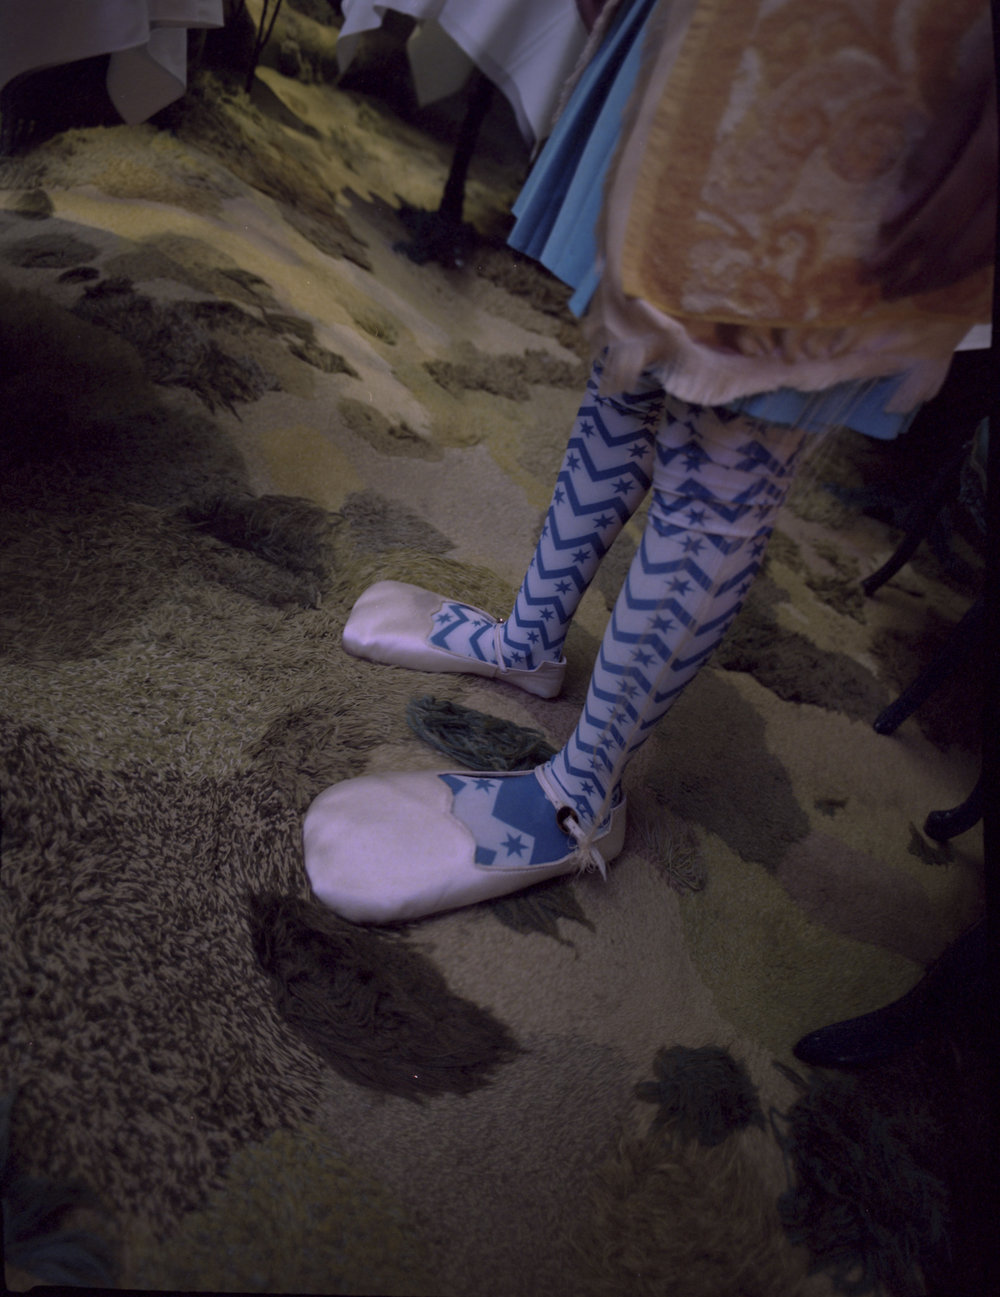 Memento No.3 by Kenzo jumper, Krasimira Stoyyneva pleated skirt, Carmen Chan stockings, Jordan Dalah shoes